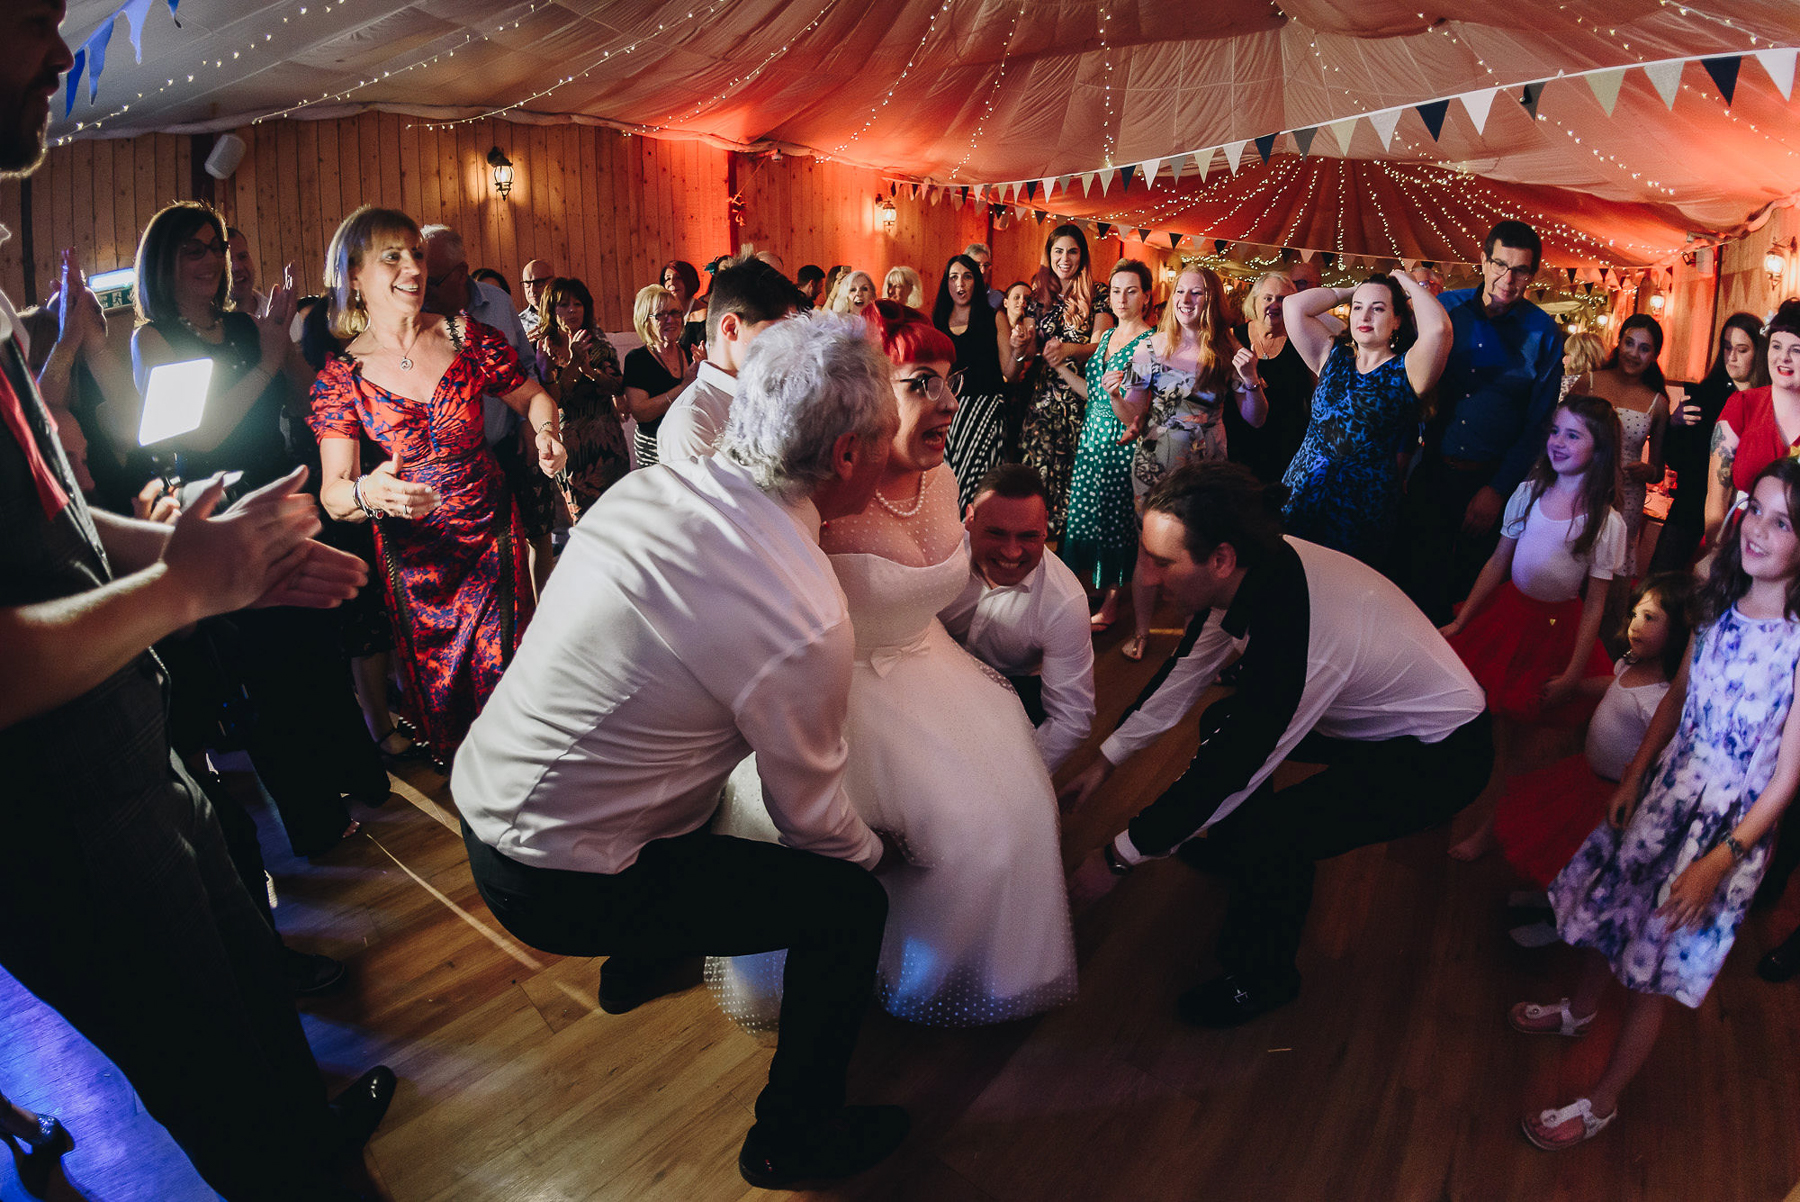 Wellbeing_Farm_Wedding_Photography_The_Pin-Up_Bride_Lara_Shaun-168.jpg